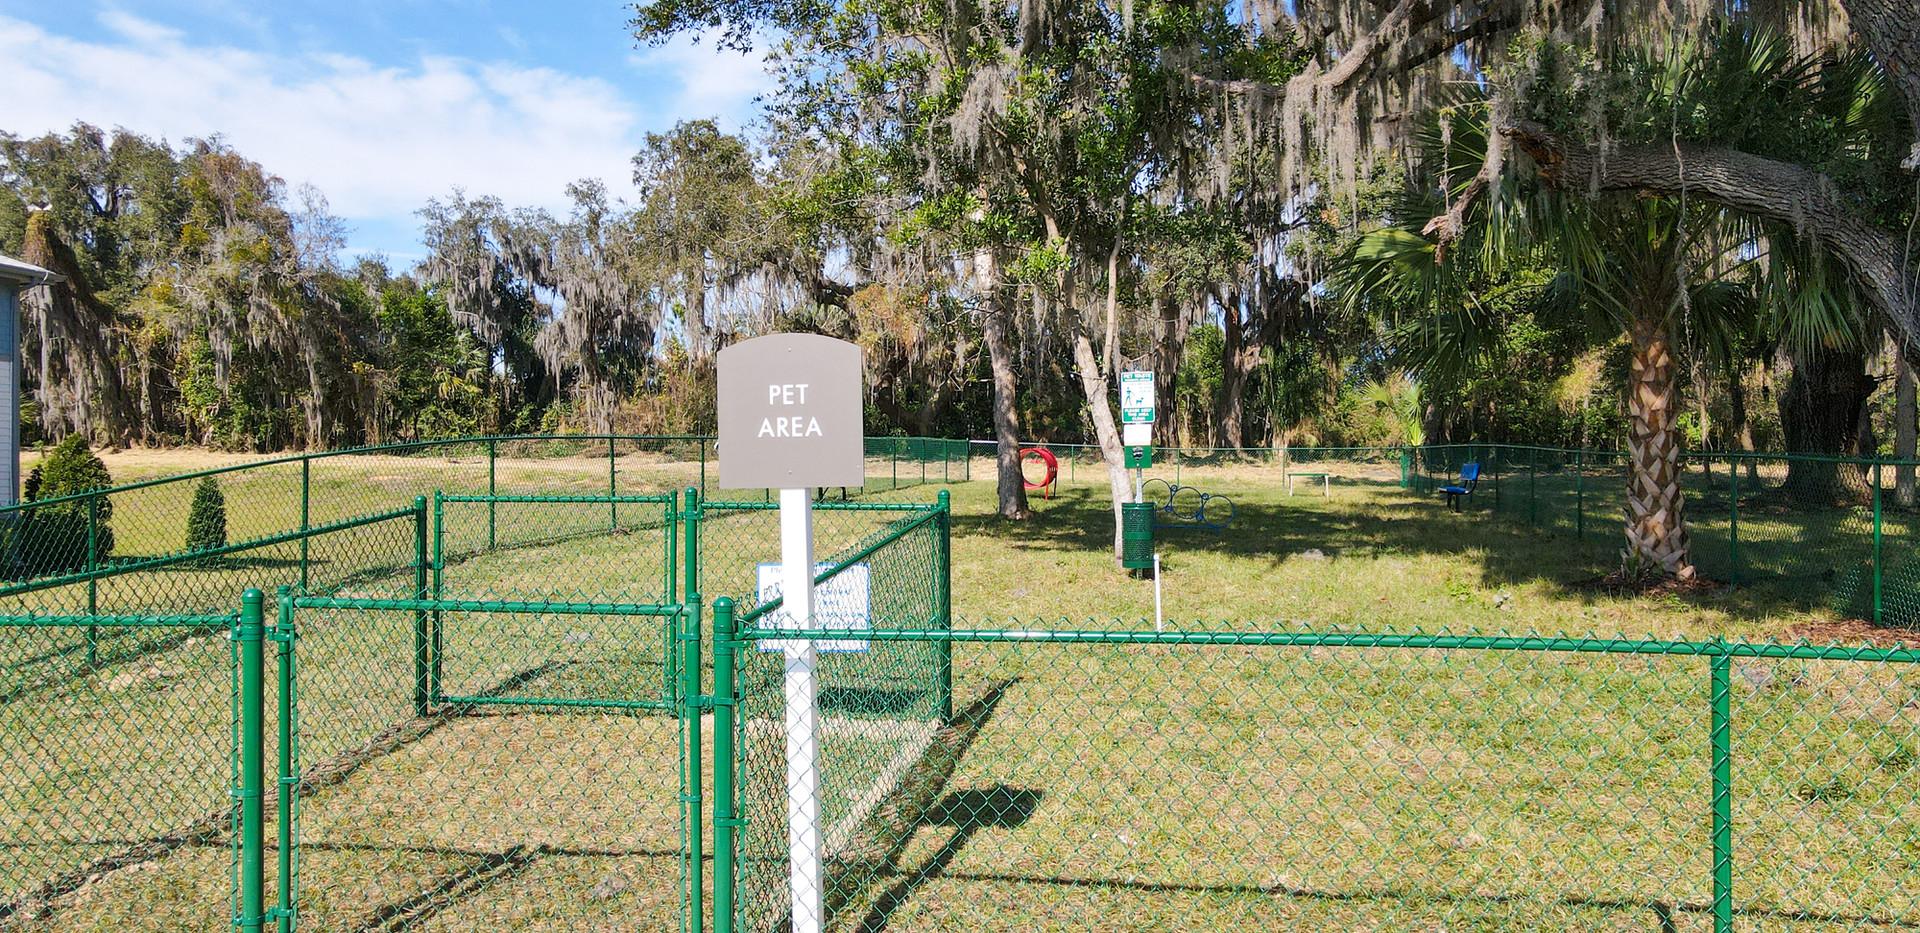 On-site dog park